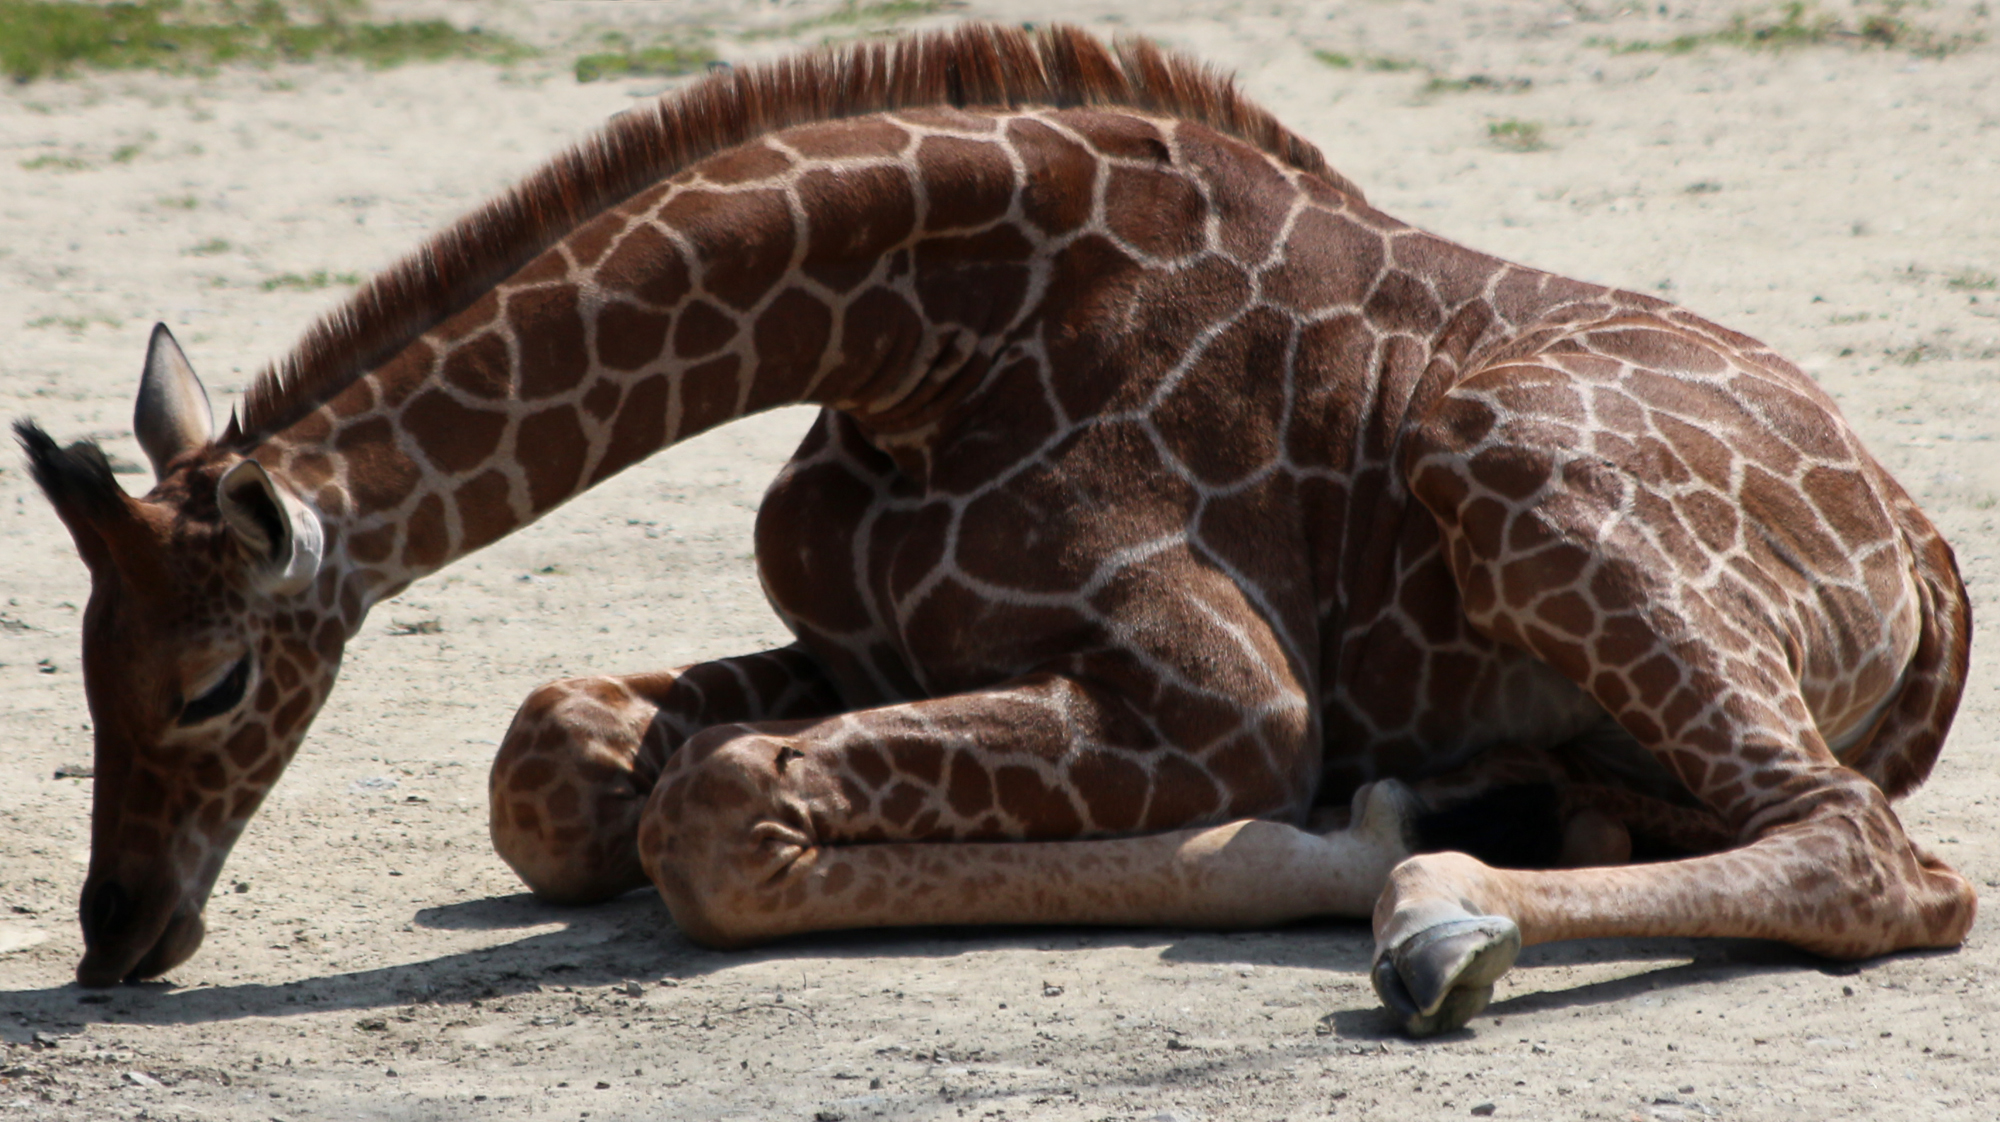 Wild animal 314 - baby giraff by Momotte2stocks